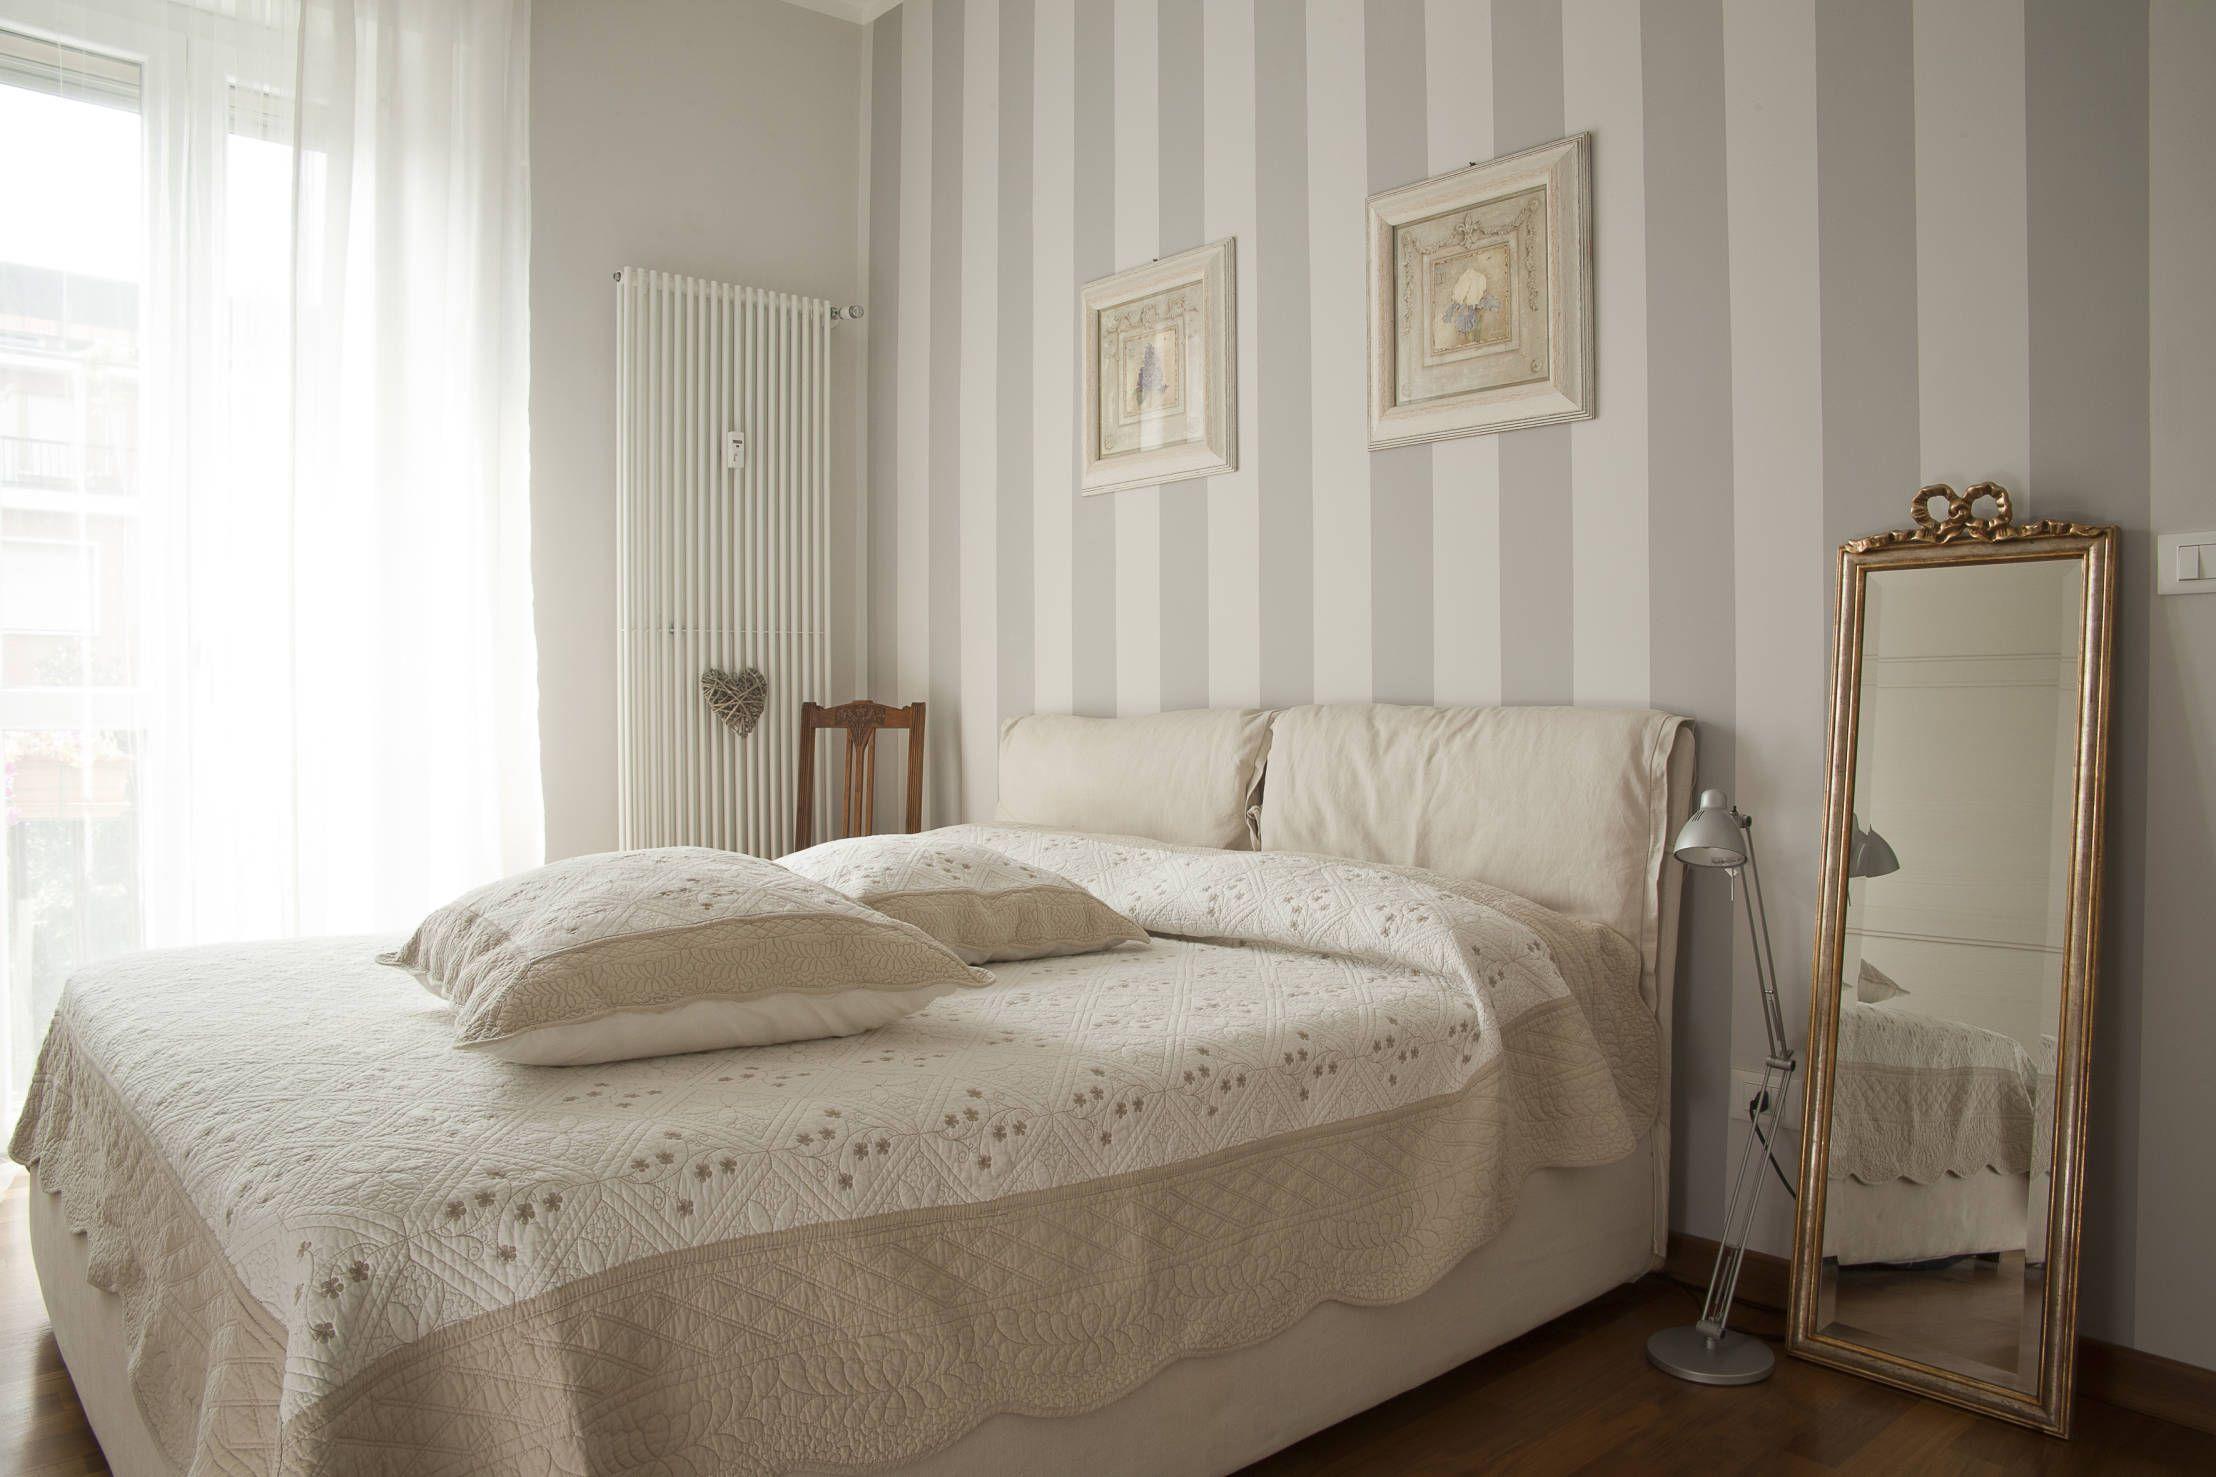 Tra le ultime novità per la camera da letto, da ikea trovate nordmela. La Casa D Artista Decoracion De Unas Estilo De Dormitorio Disenos De Dormitorios